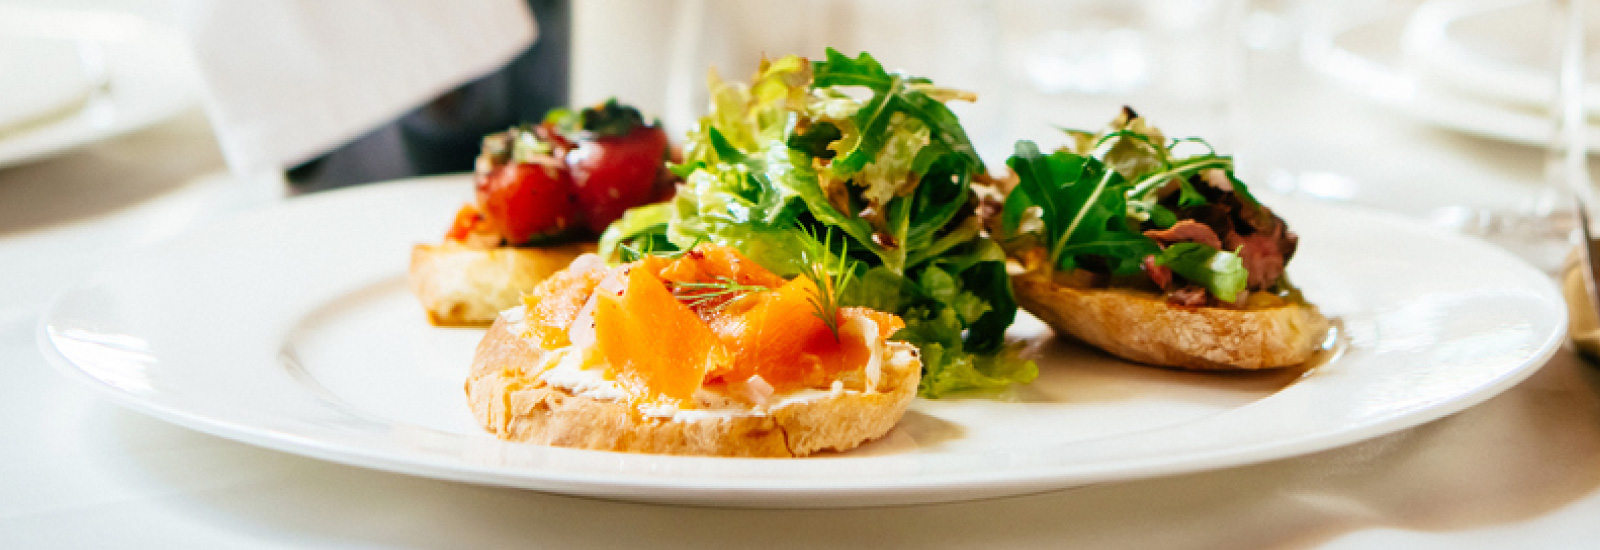 TripAdvisor's Top 5 Newport, RI Restaurants